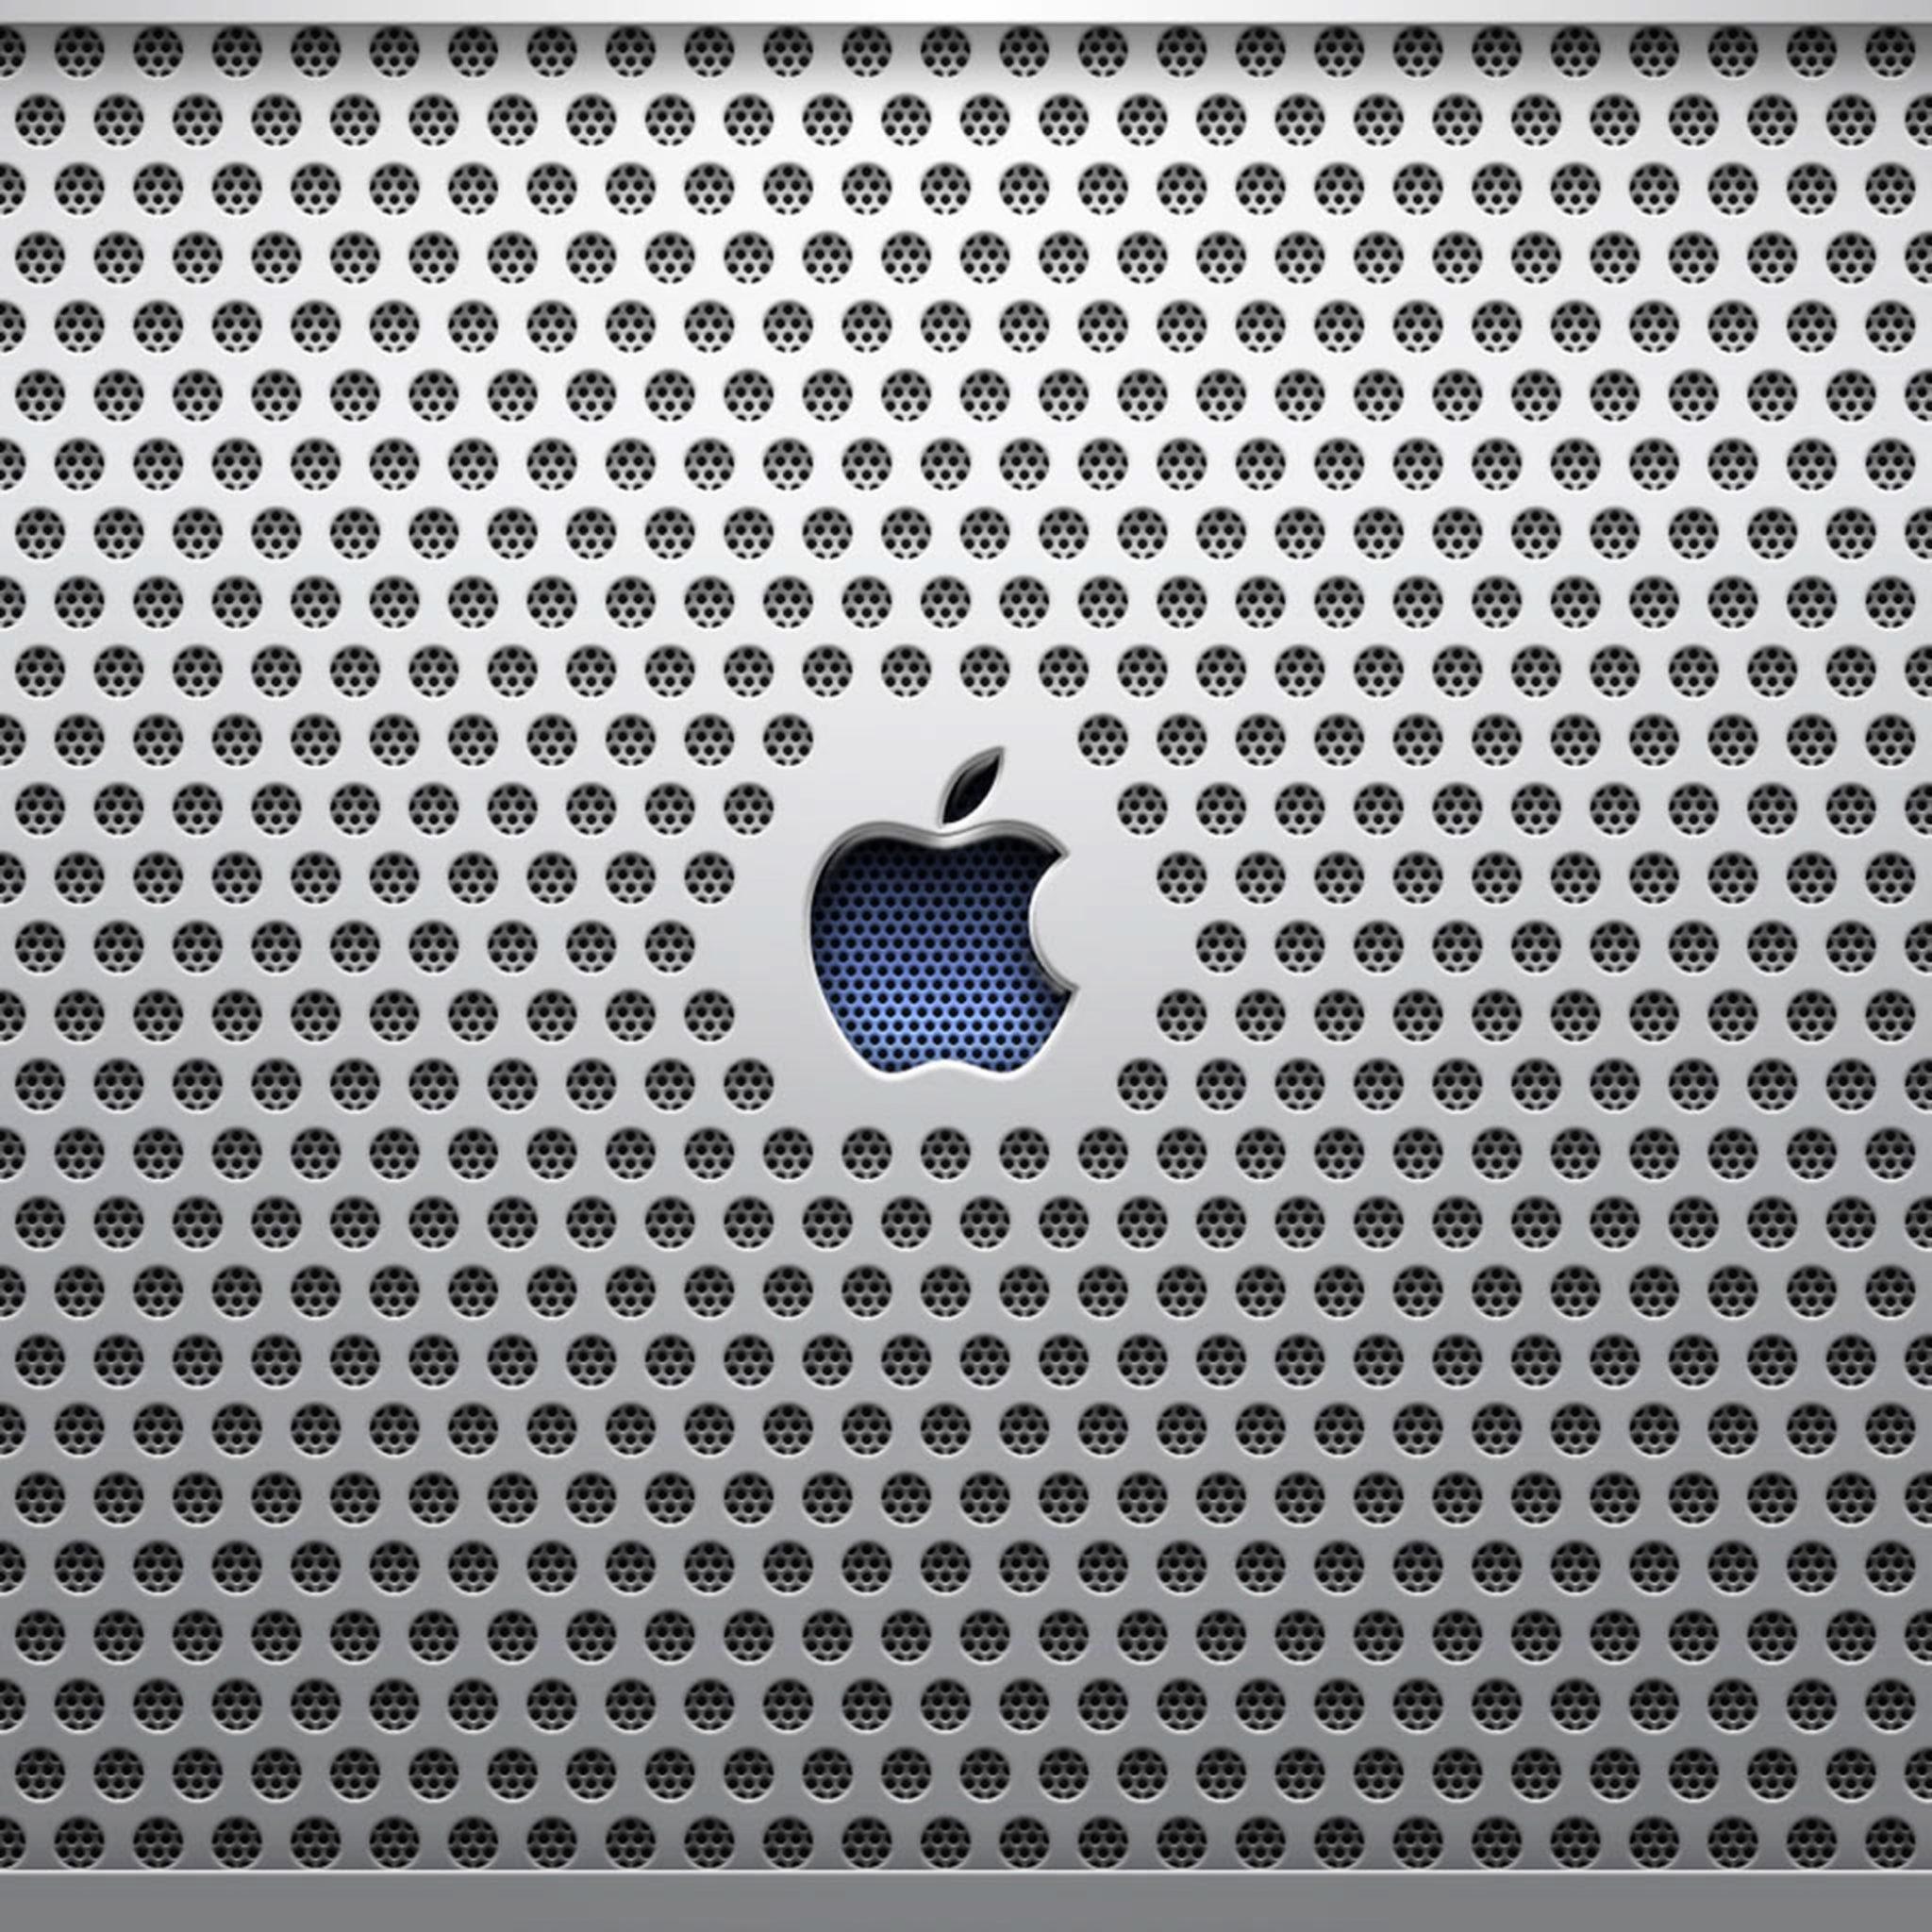 2048x2048 wallpapers iPad retina Apple Industrial Ipad Wallpaper 2048x2048 pixels resolution